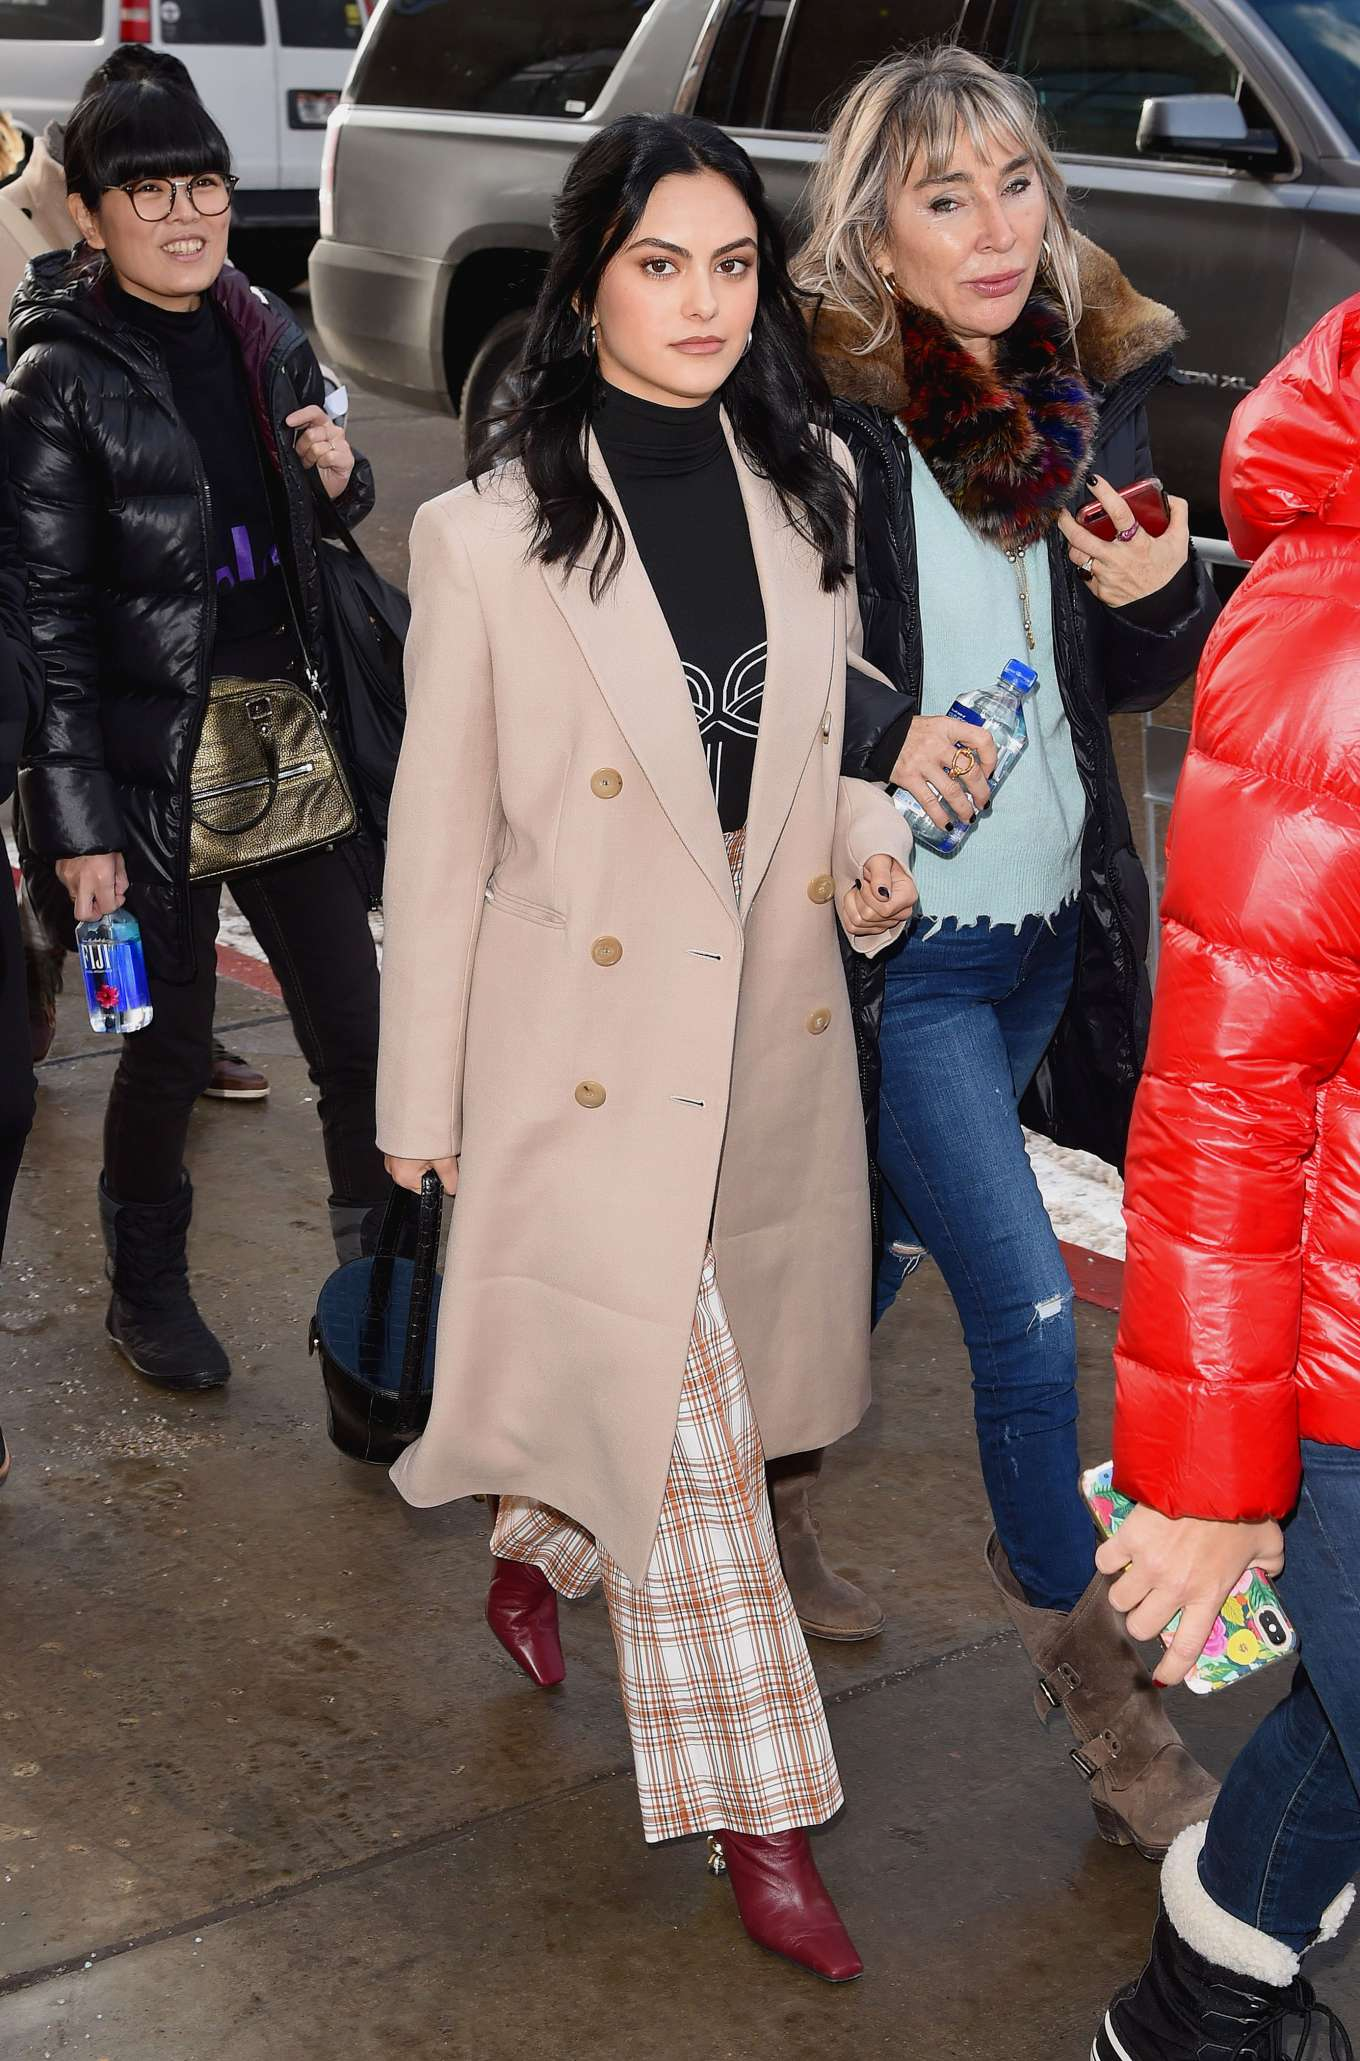 Camila Mendes - Around at Sundance Film Festival in Park City